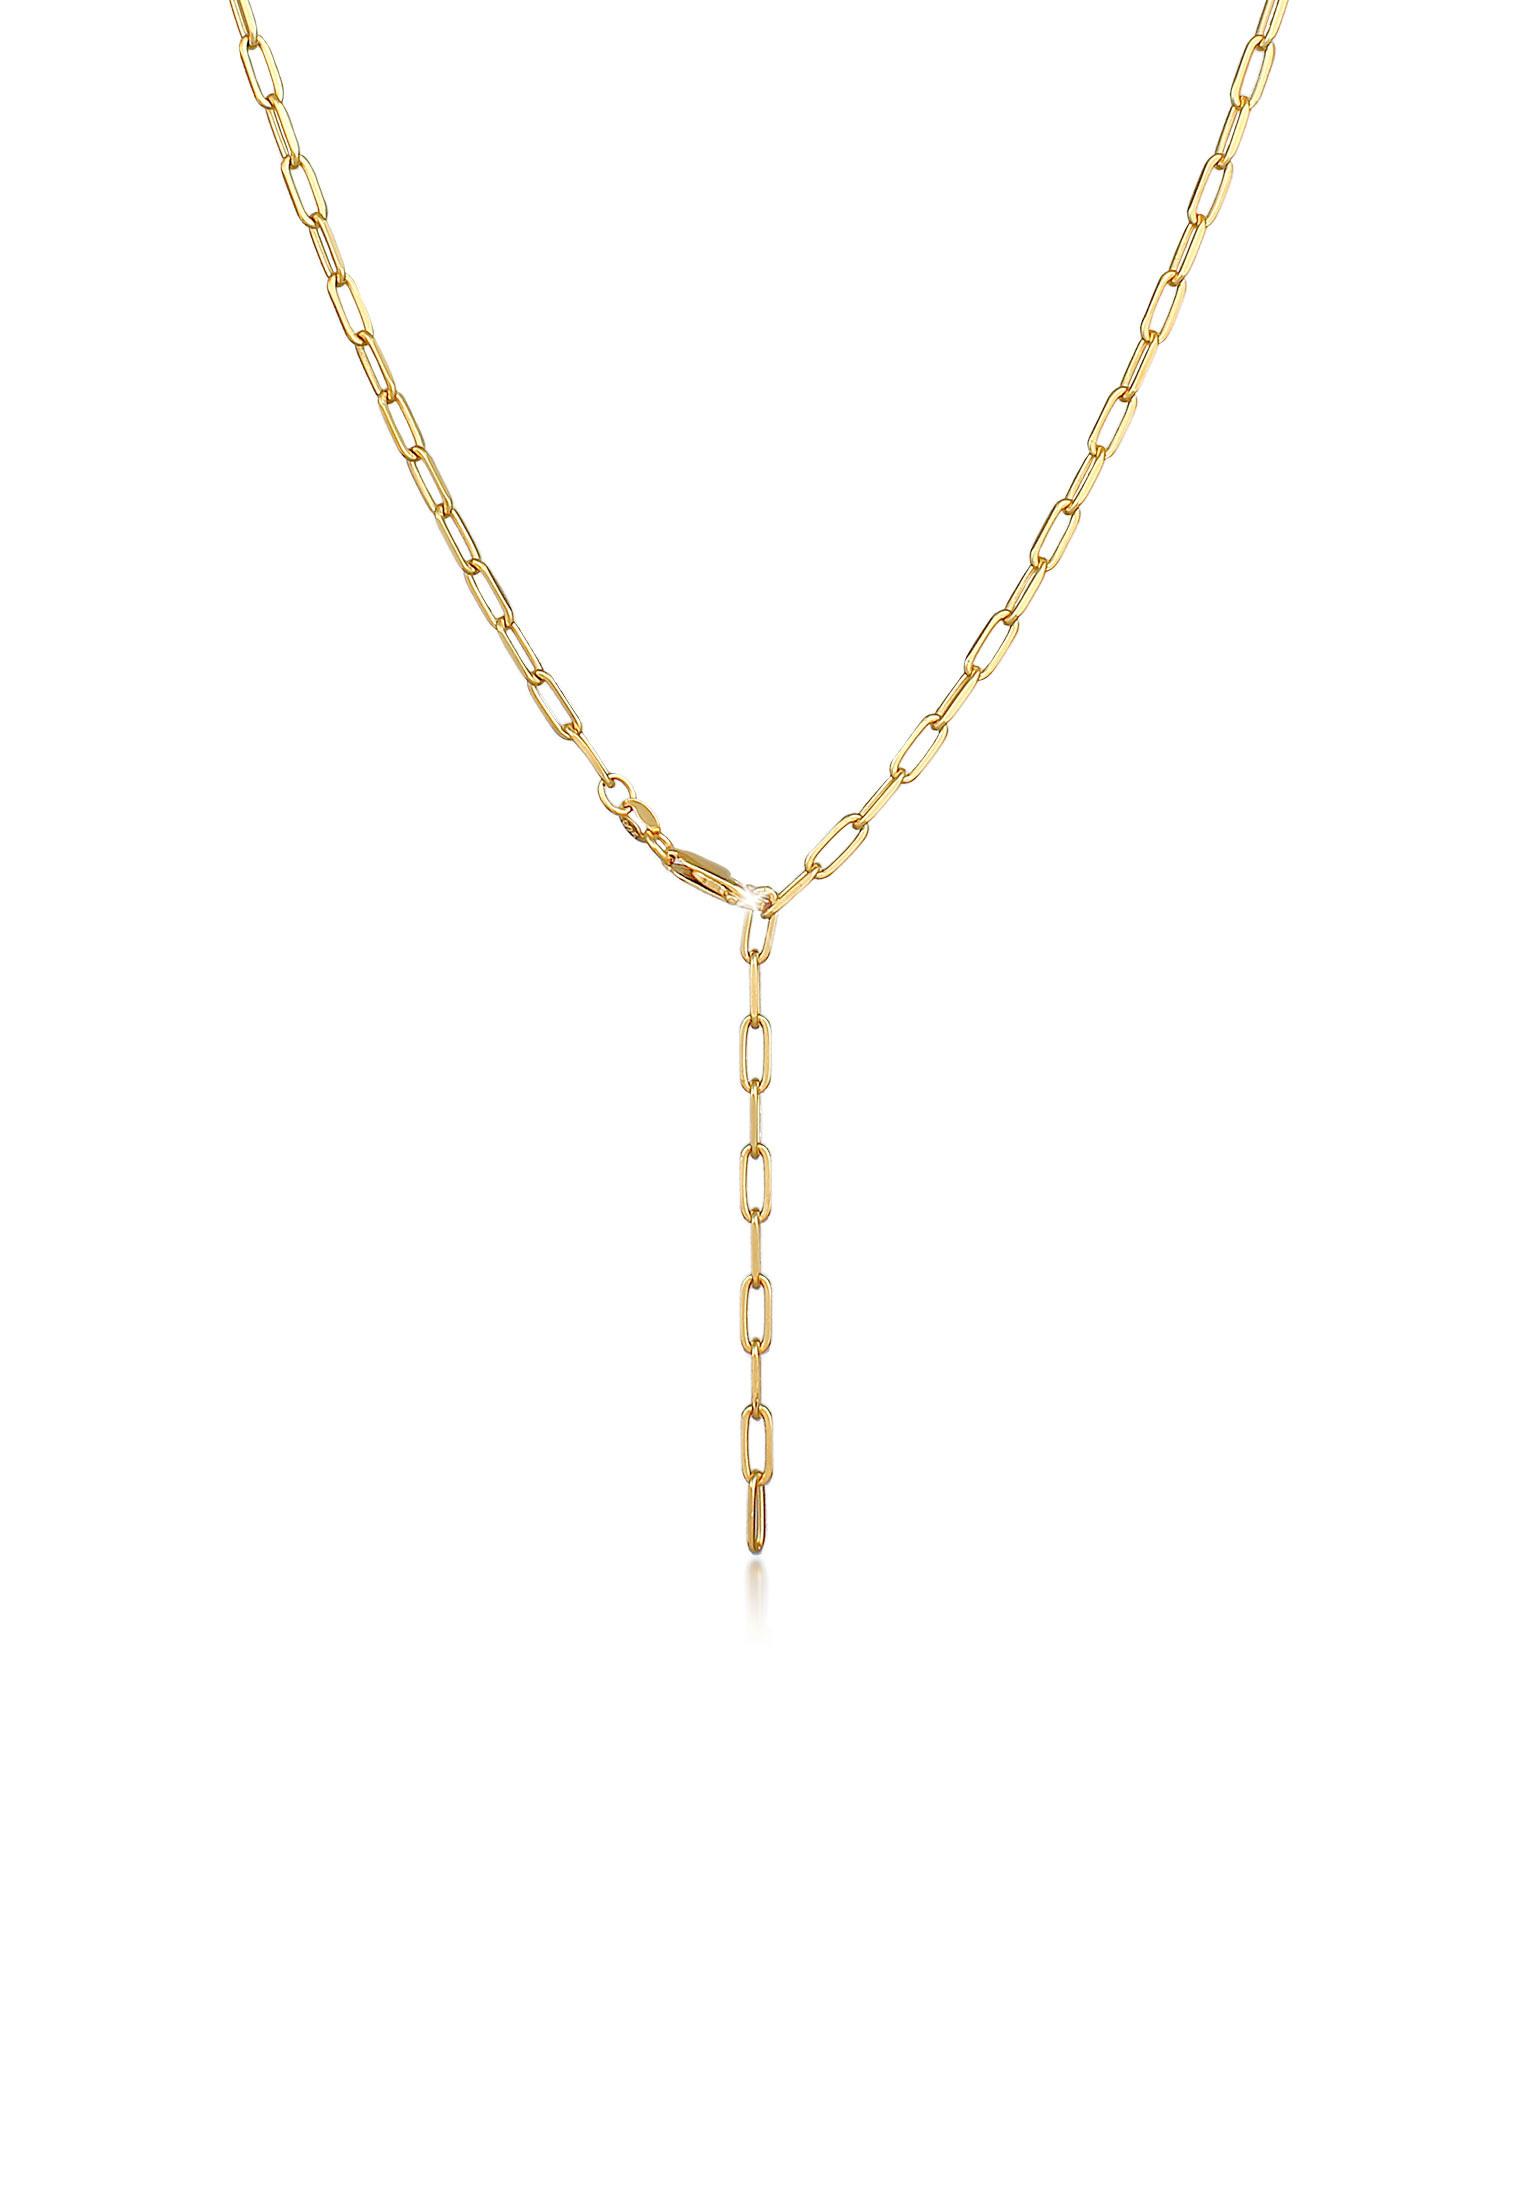 Glieder-Y-Halskette   925 Sterling Silber vergoldet